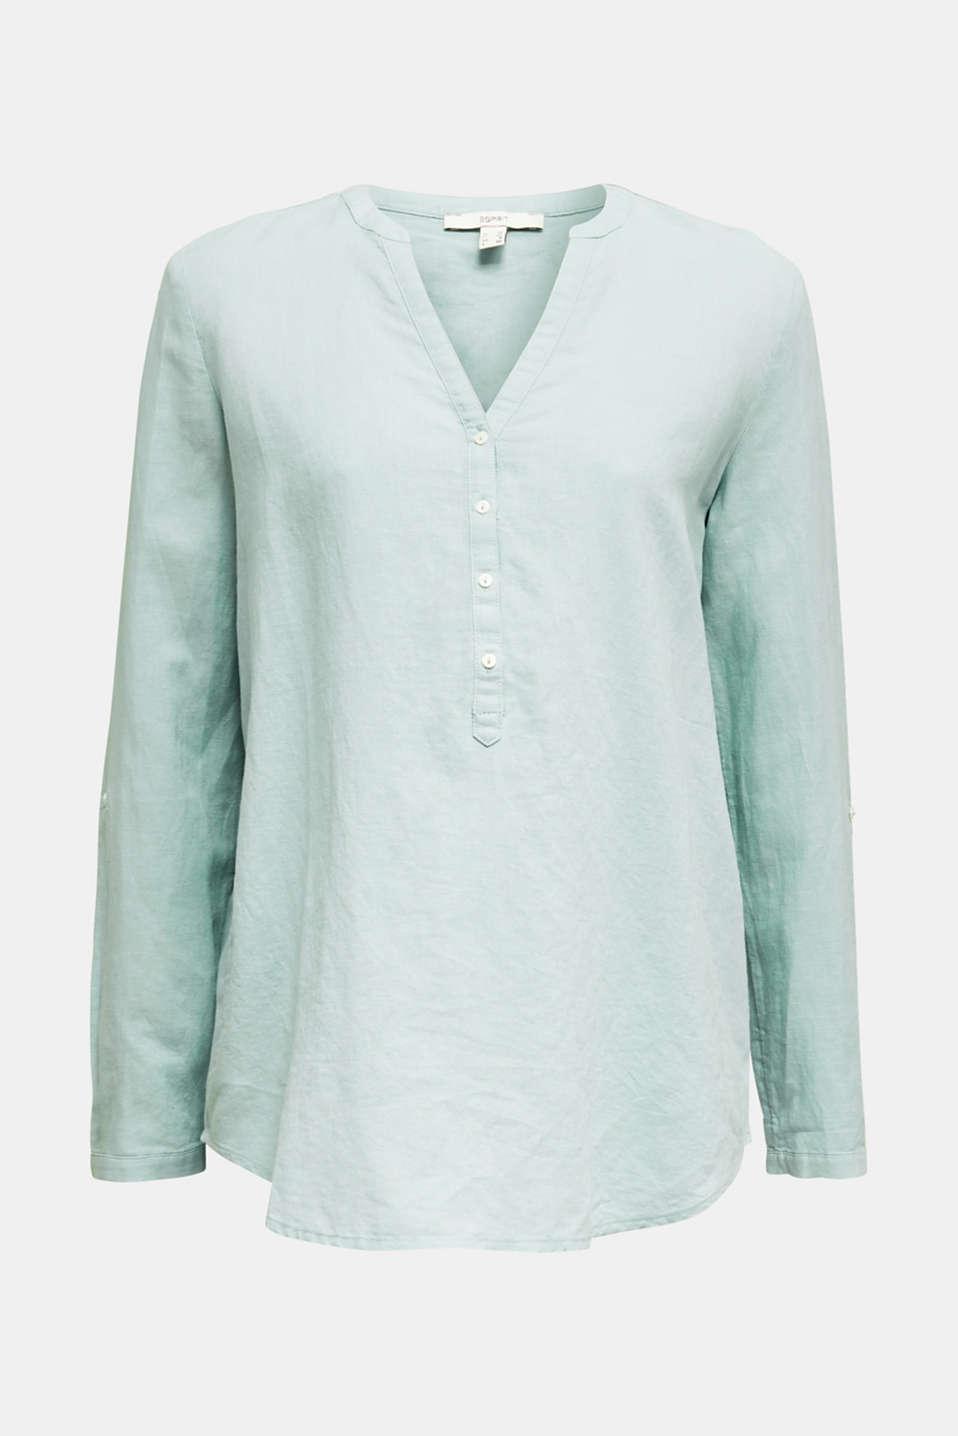 Turn-up blouse in blended linen, LIGHT AQUA GREEN, detail image number 7